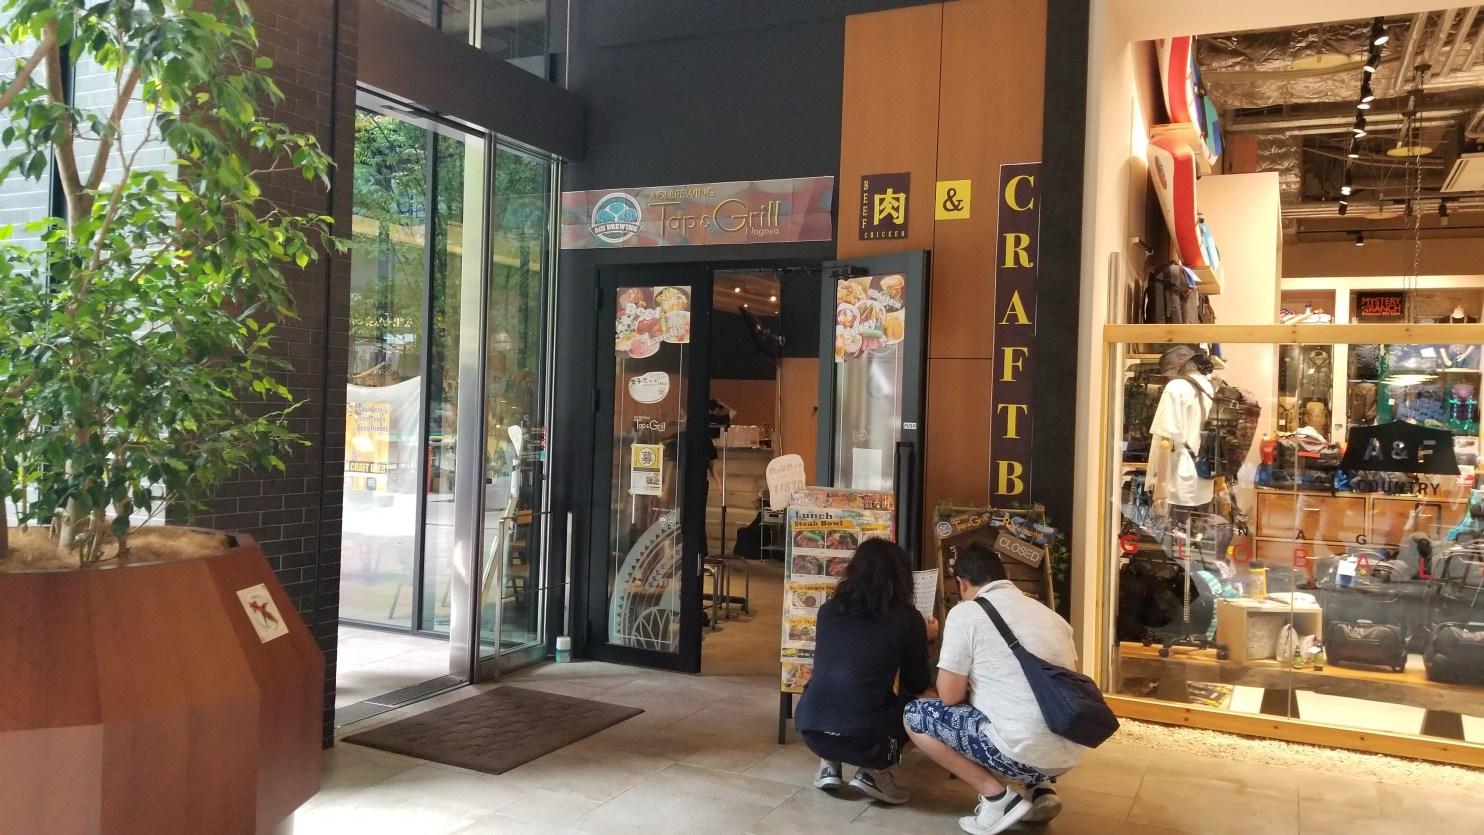 Aoi Brewing and Grill Front・アオイ ブリューイング タップアンドグリルフロント